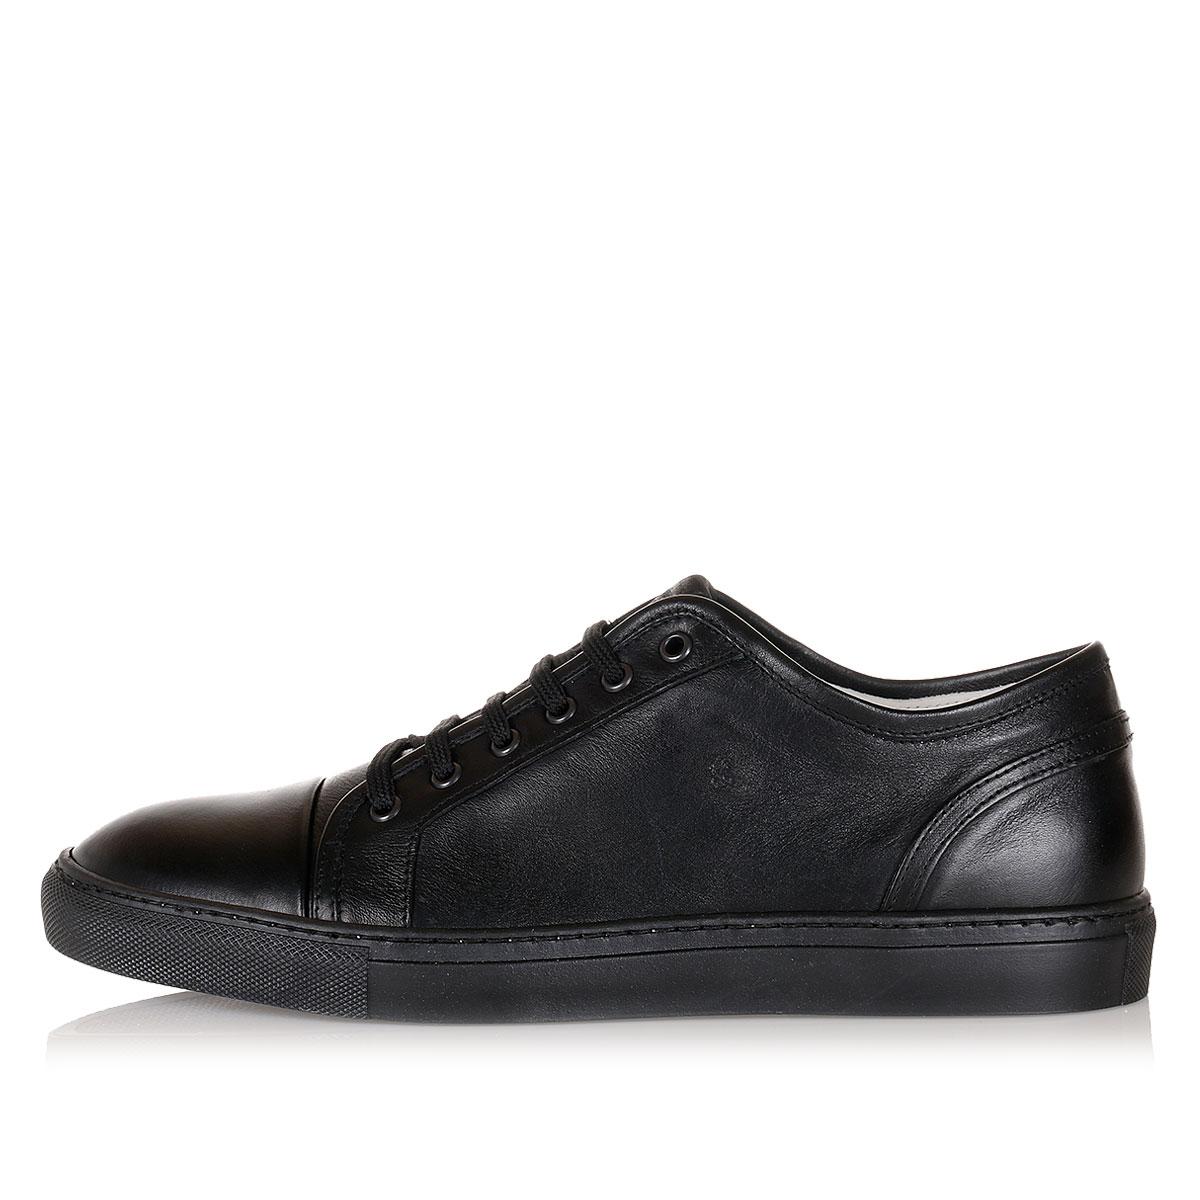 armani men leather sneakers spence outlet. Black Bedroom Furniture Sets. Home Design Ideas